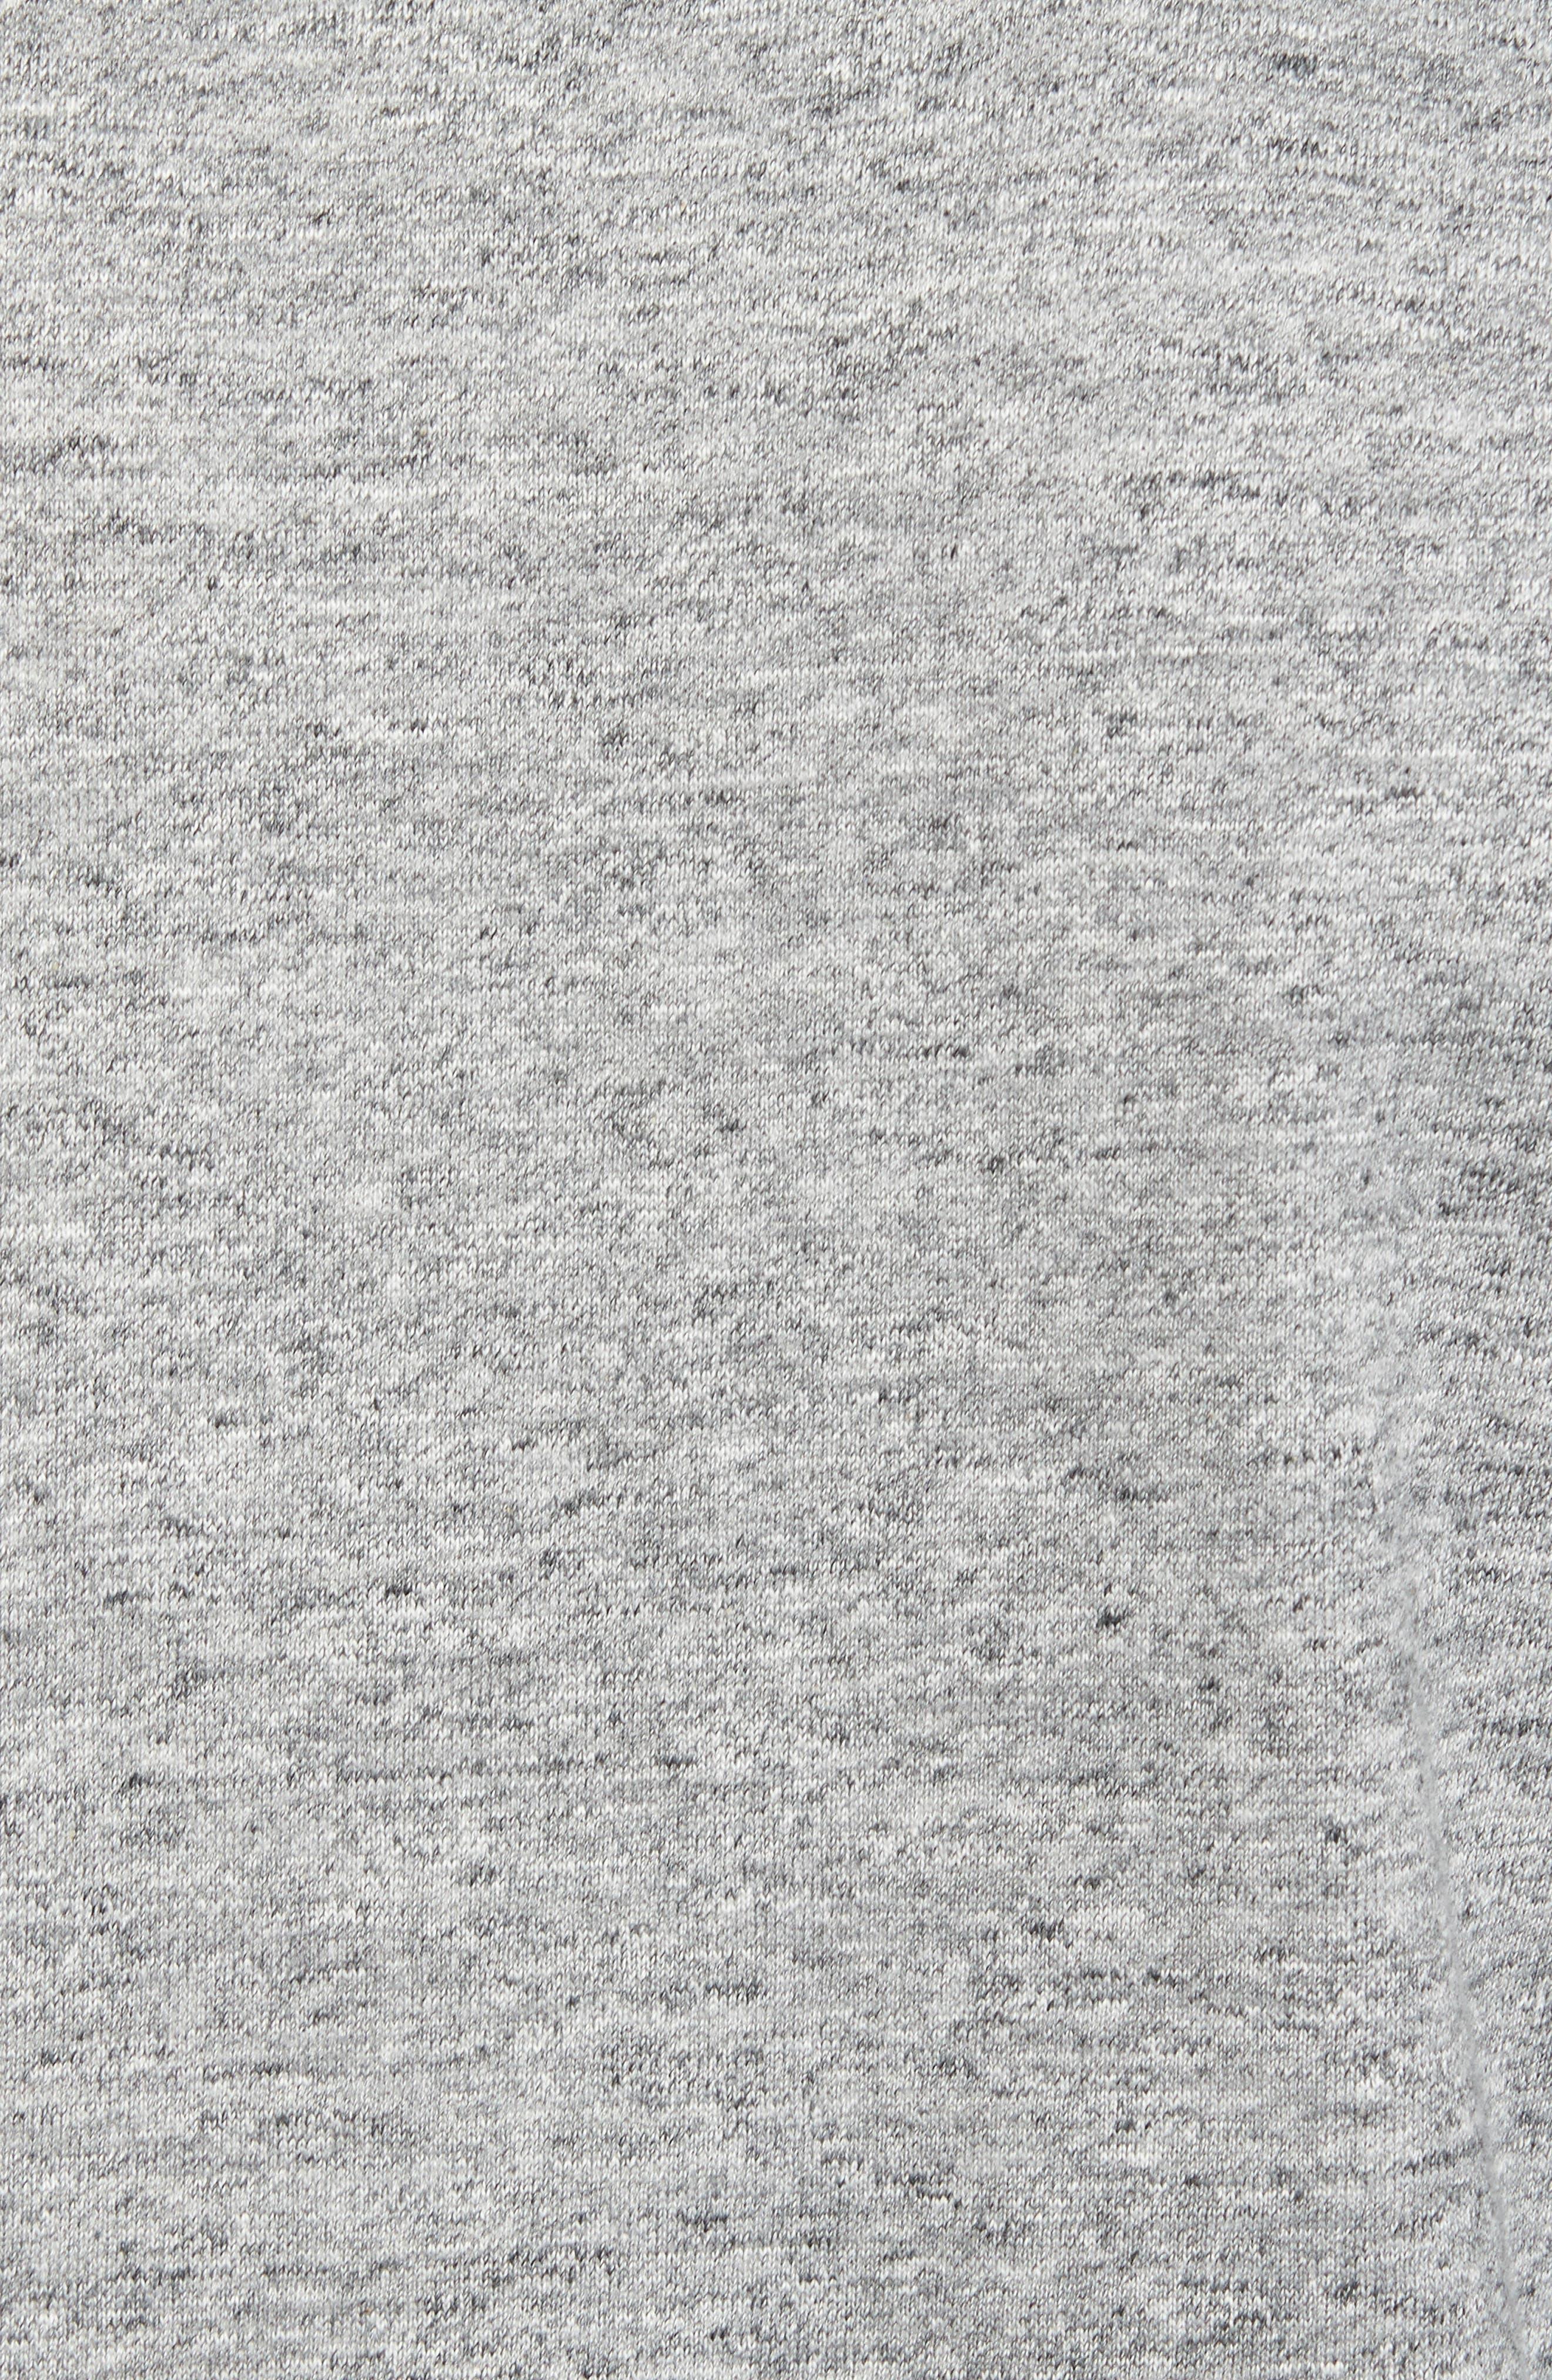 Legacy Raglan Crewneck Sweatshirt,                             Alternate thumbnail 5, color,                             092